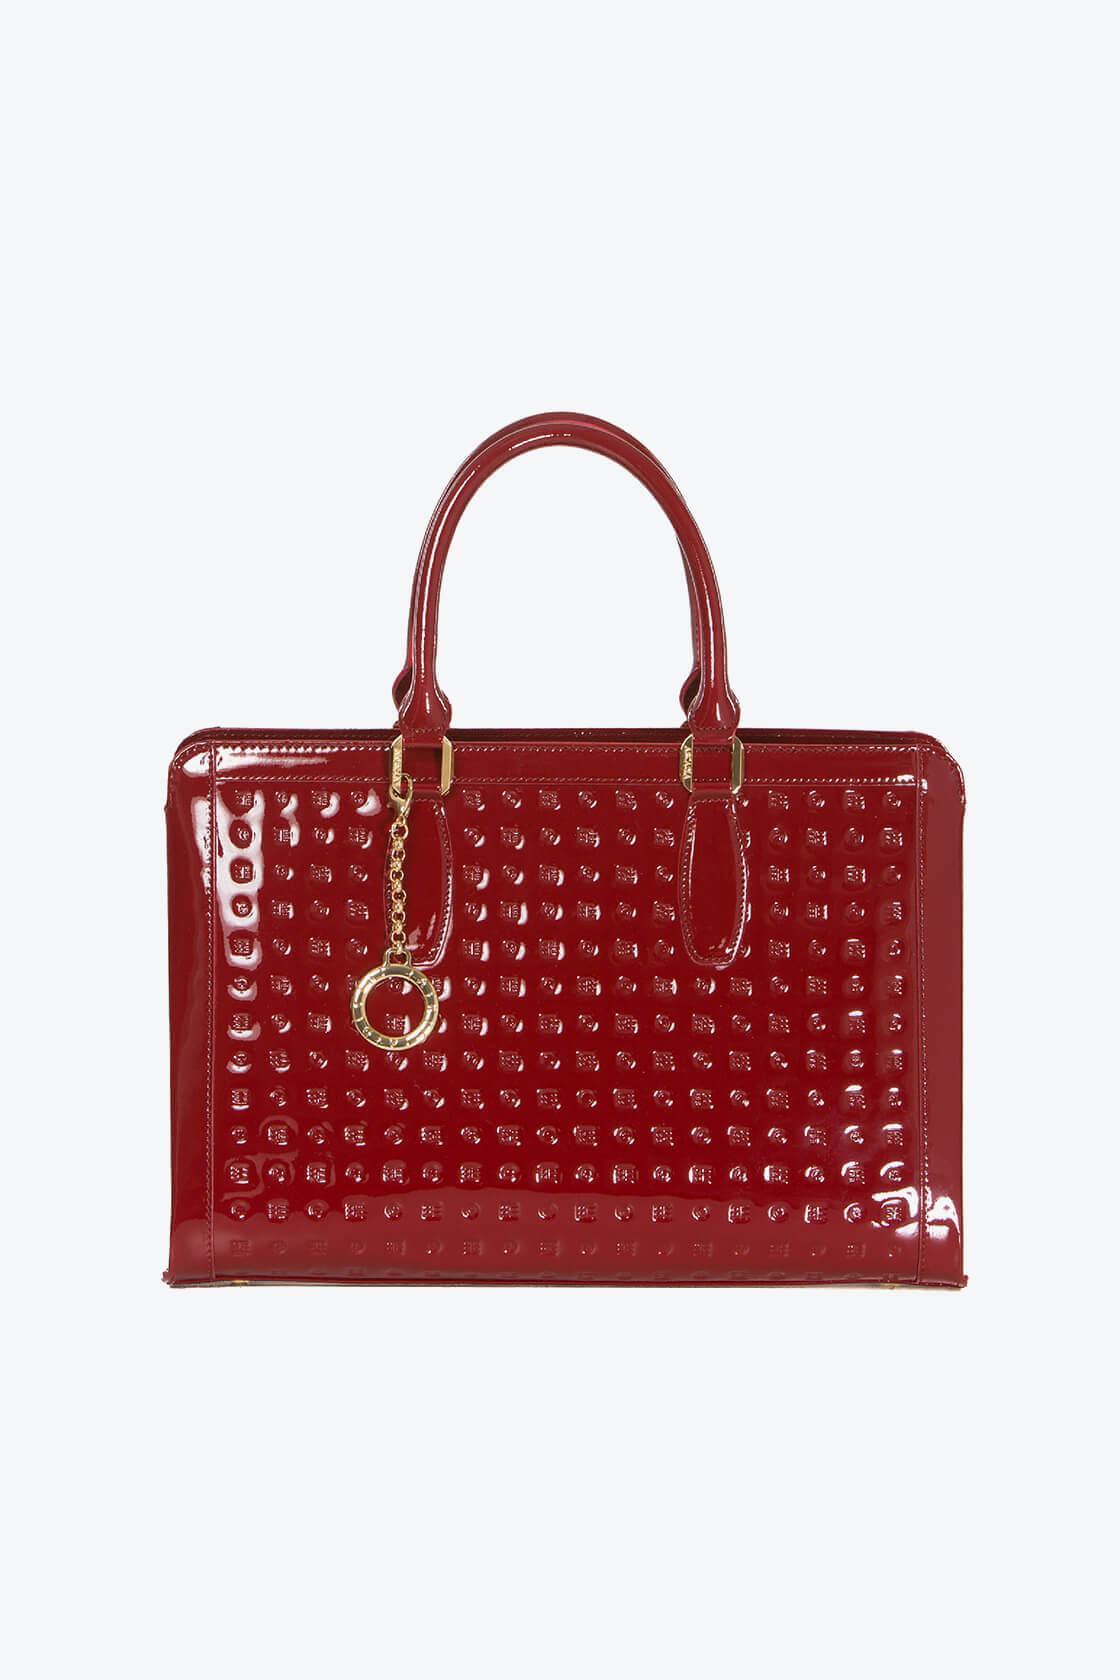 ol80000248 business large top handles bag 1